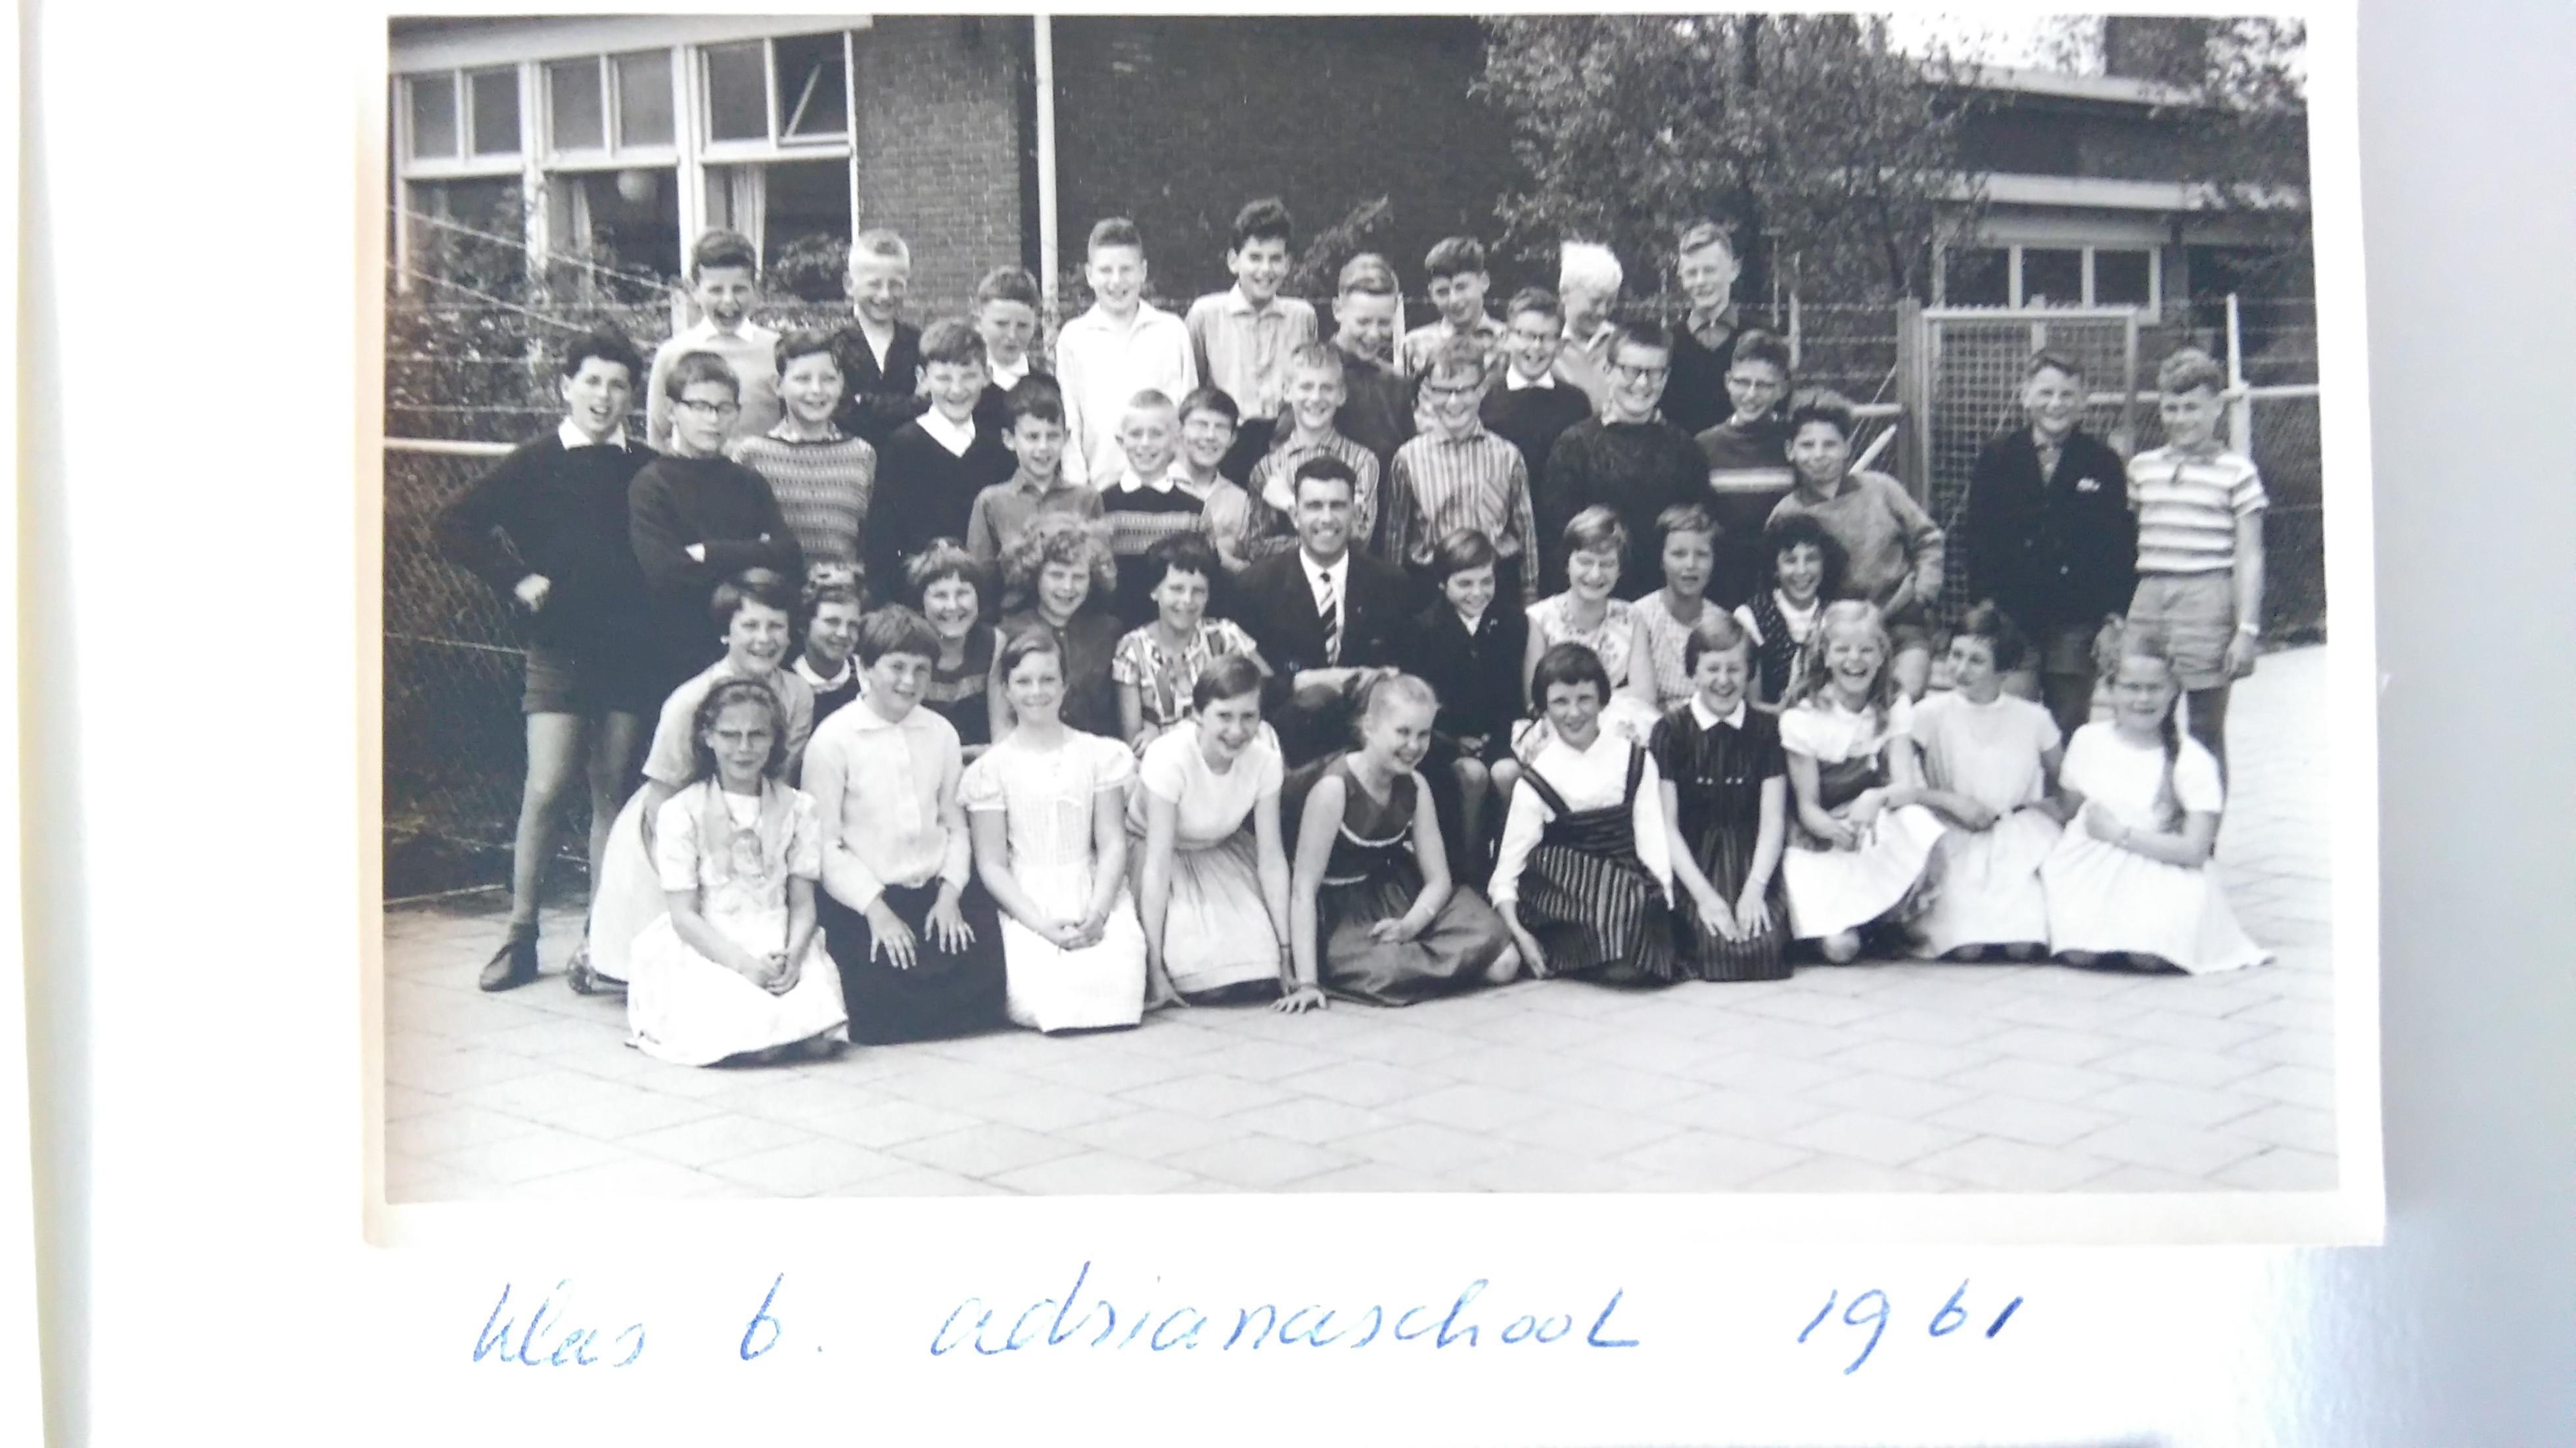 adrianaschool foto